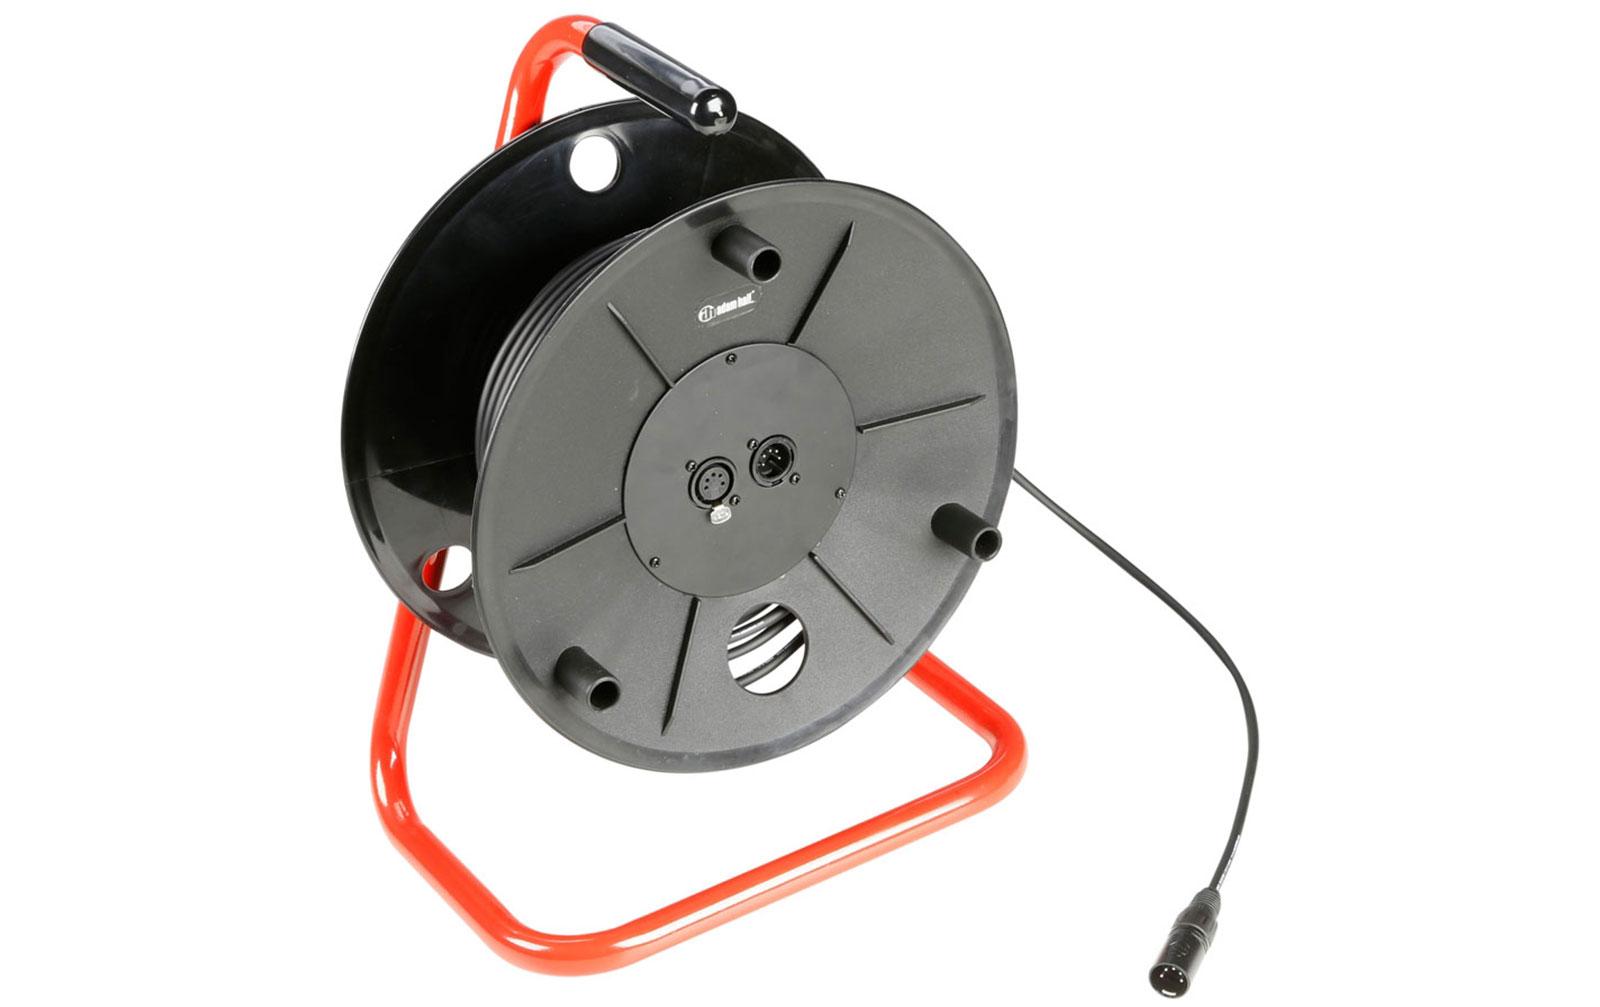 adam-hall-k-3-cddmx-5030-kabeltrommel-5-pin-dmx-aes-30-m